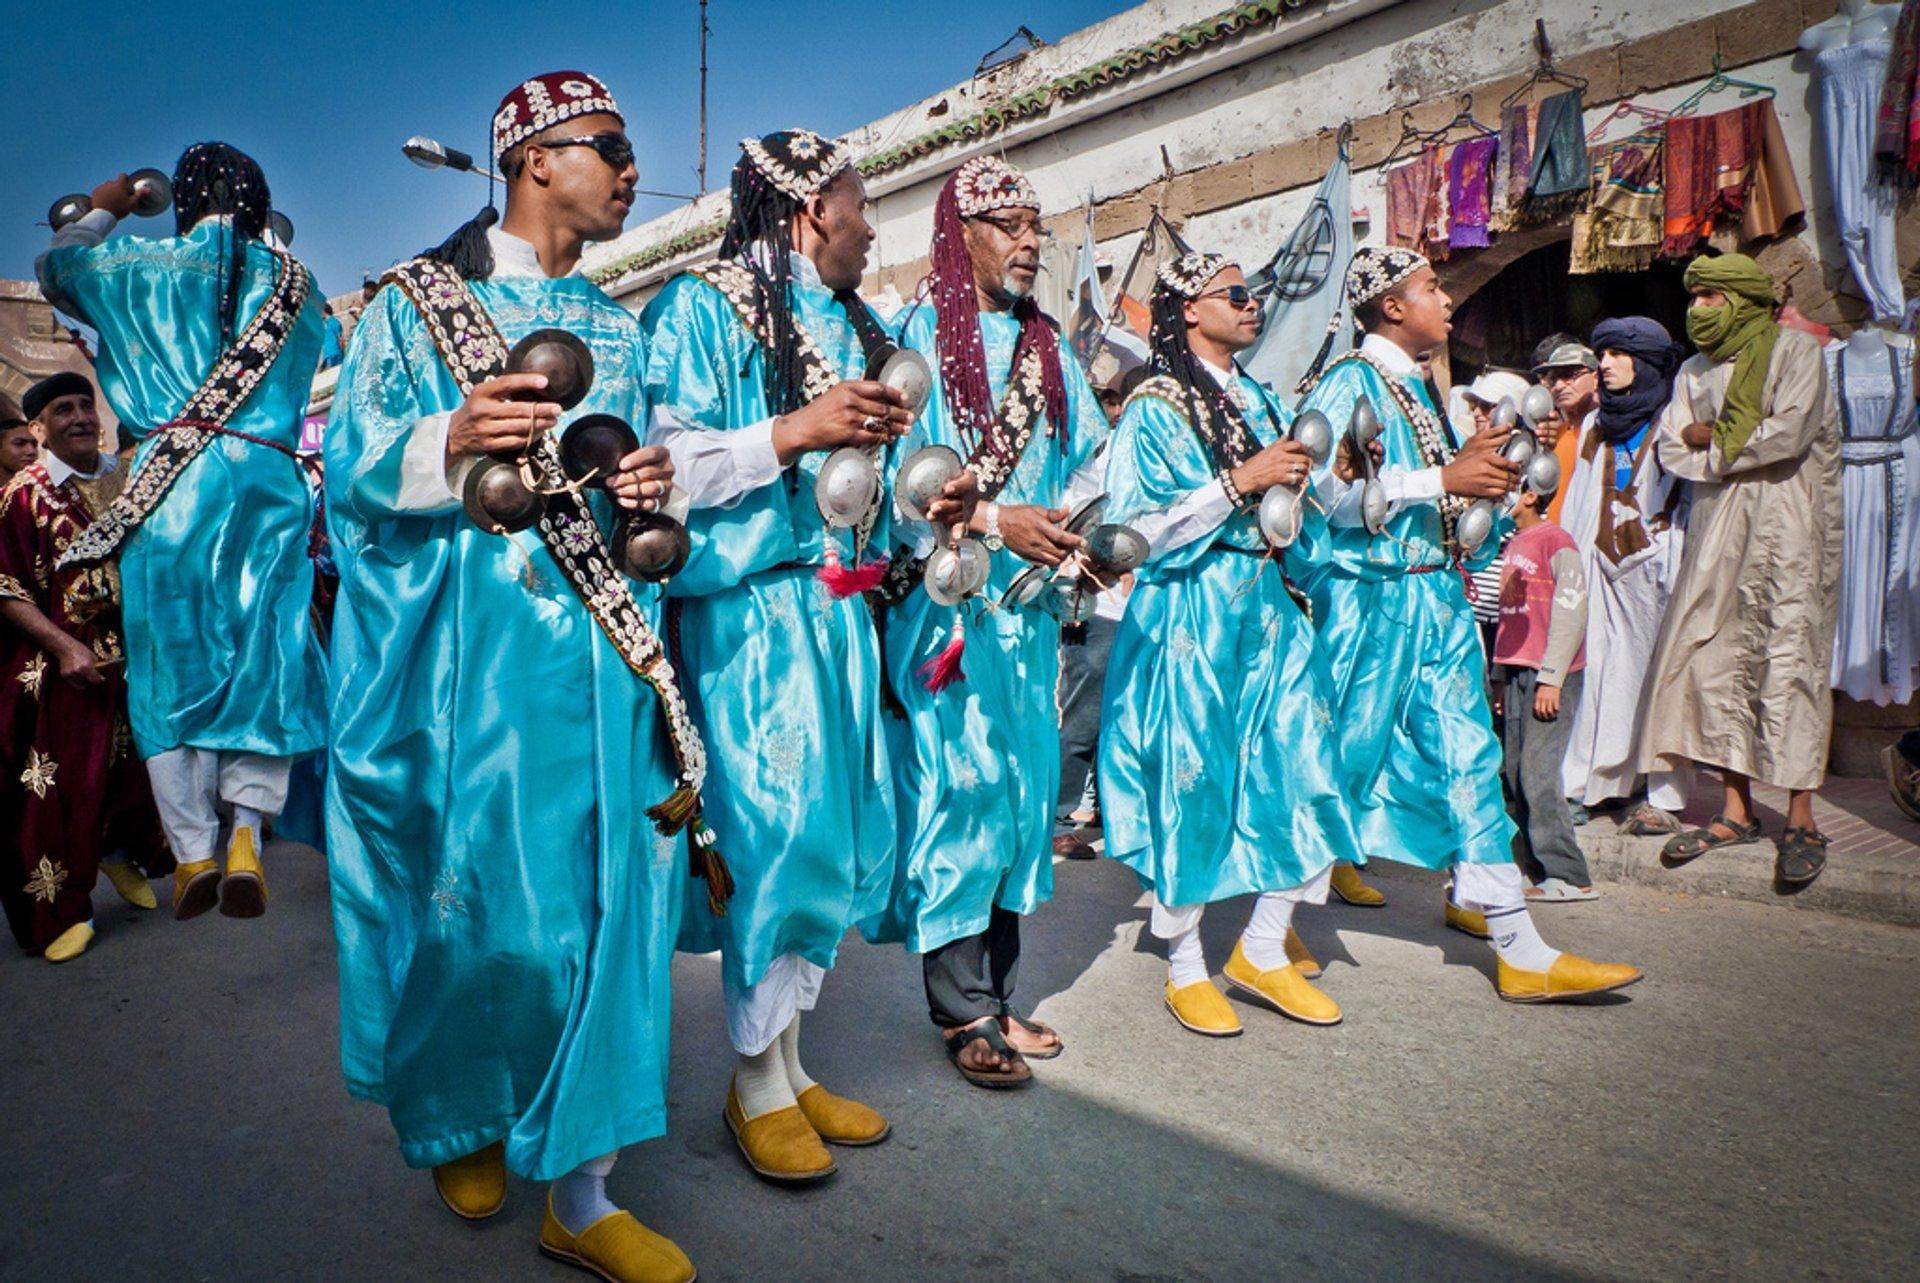 Gnaoua World Music Festival in Morocco - Best Season 2020